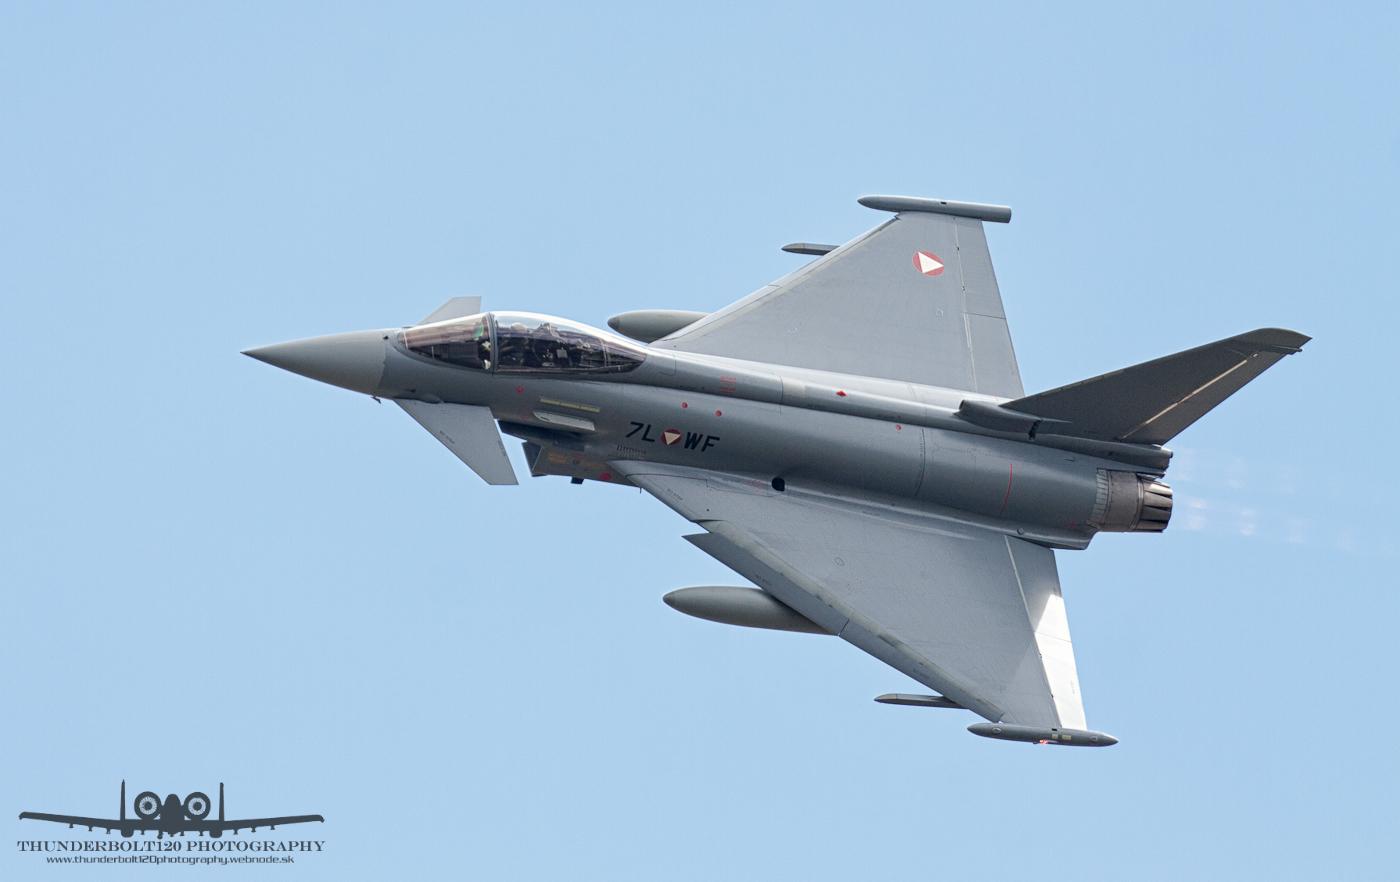 Eurofighter EF-2000 Typhoon S 7L-WF